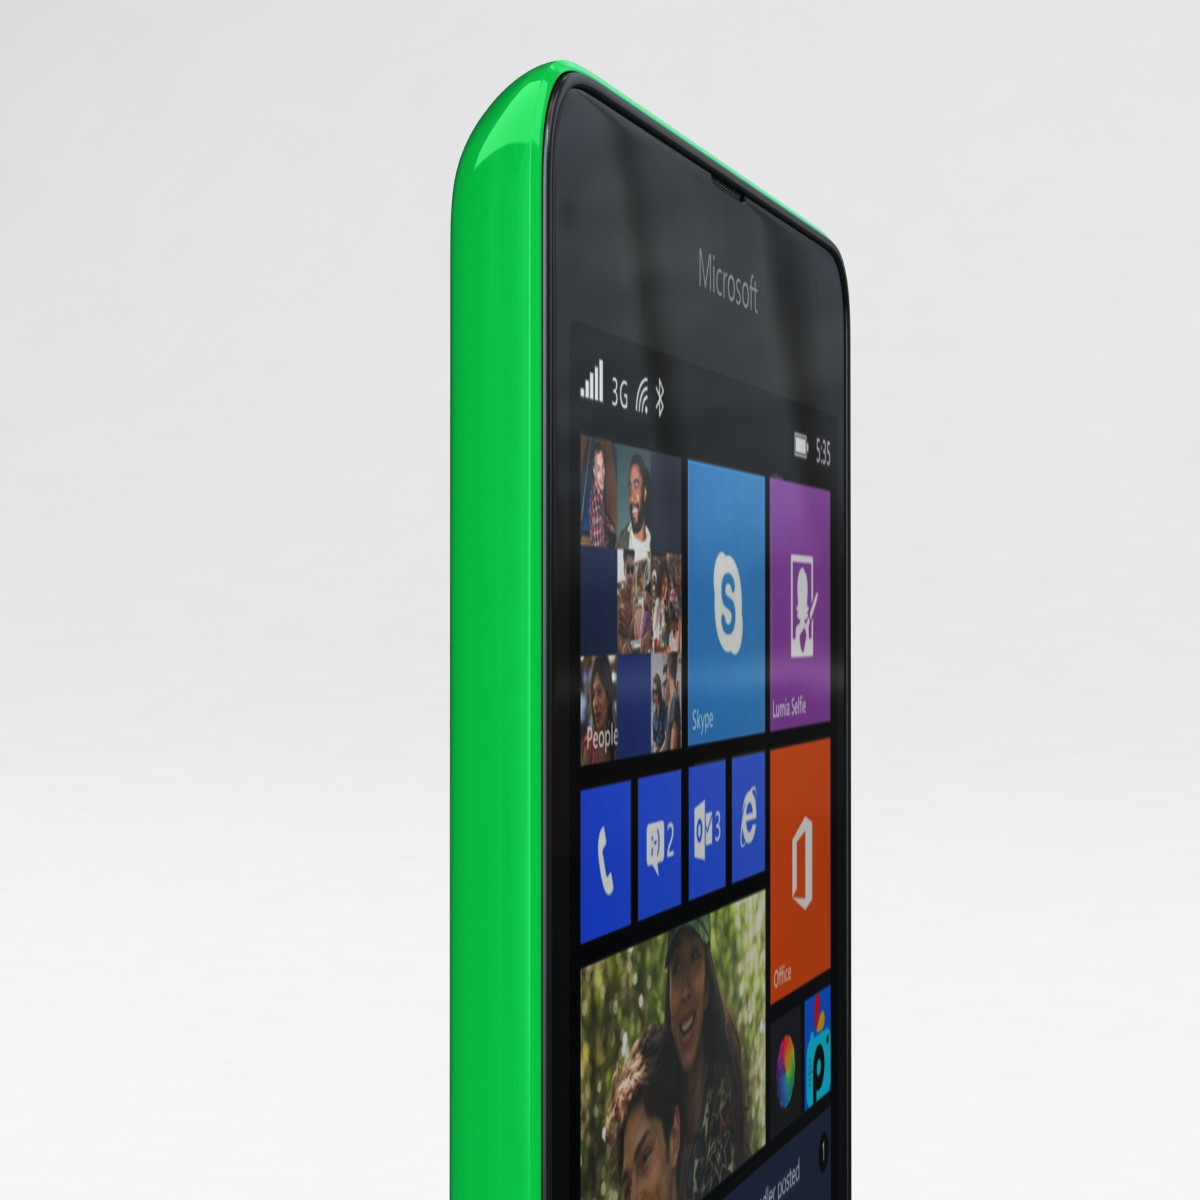 microsoft lumia 535 and dual sim green 3d model 3ds max fbx c4d obj 204180